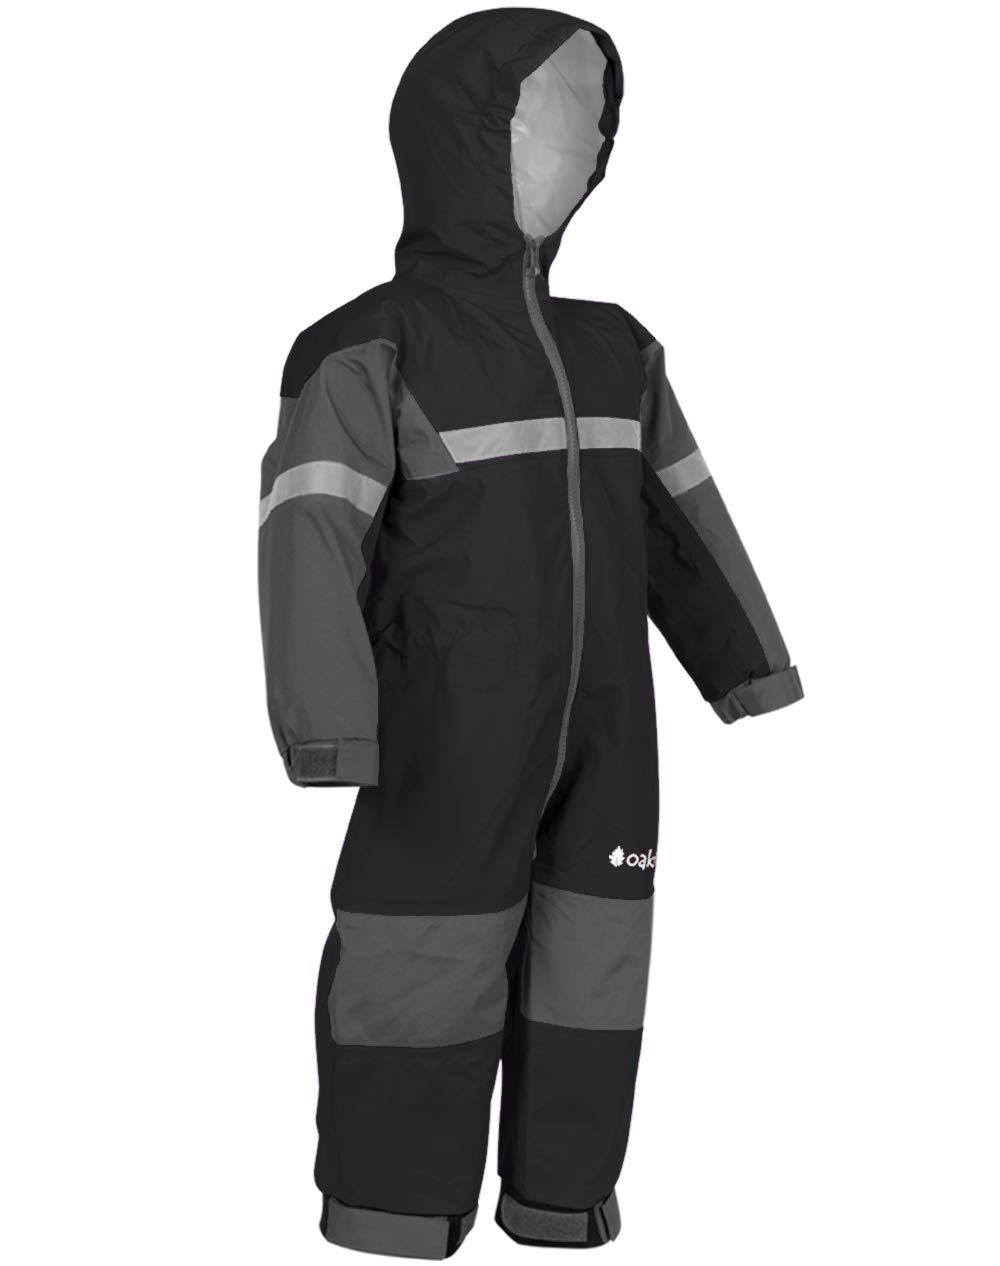 OAKI Rain Suit Kids - Toddler Snowsuit - One Piece Rain Jacket/Pant for Girls & Boys, Black, 4 Toddler by OAKI